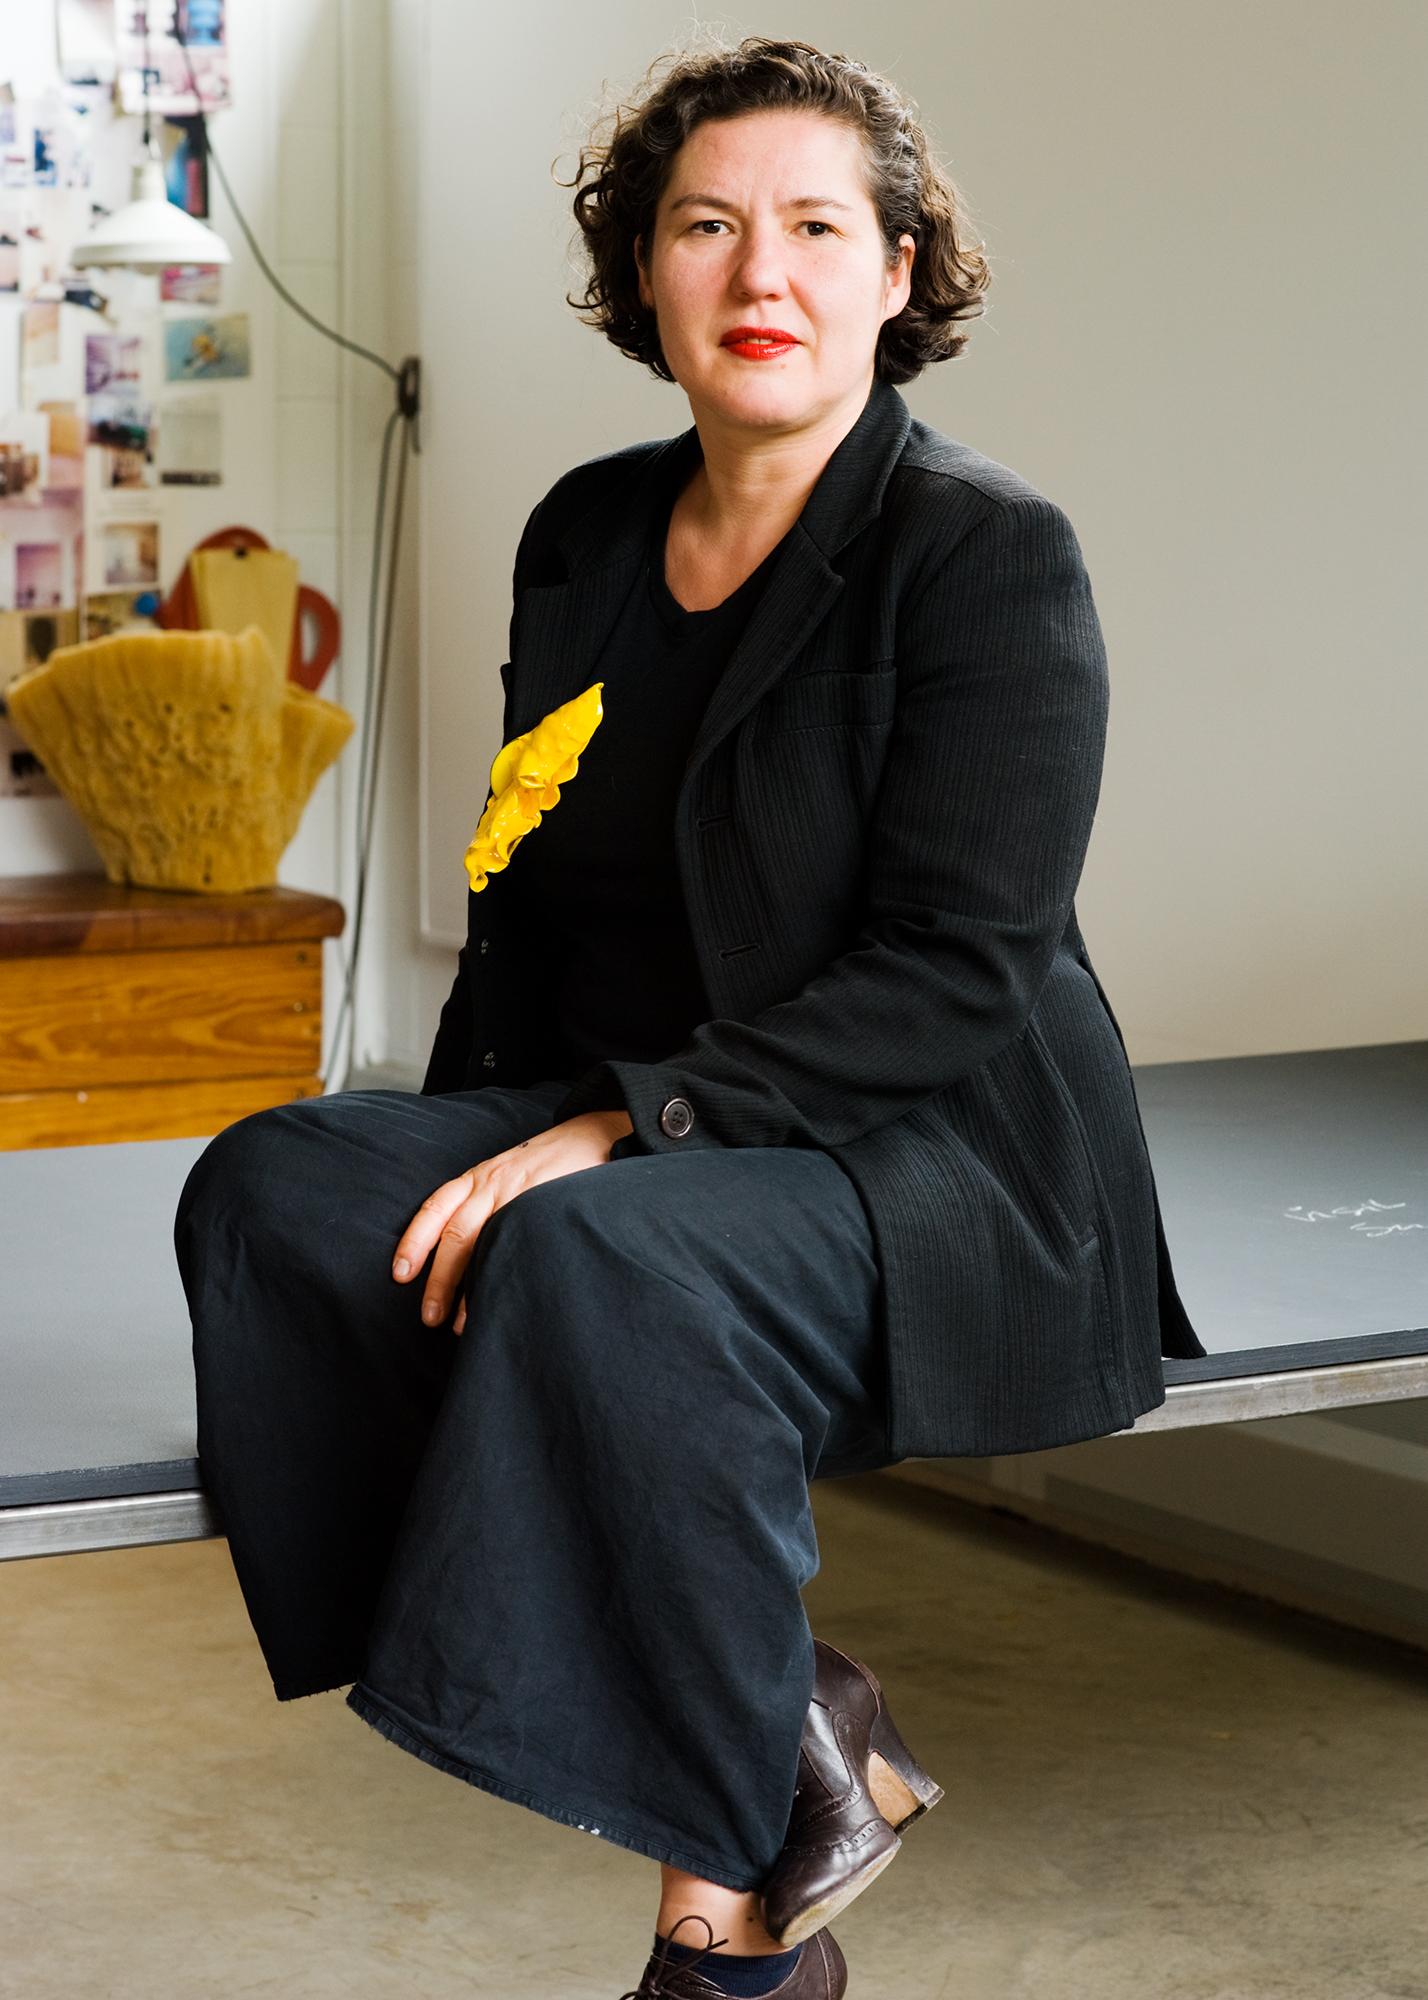 Iris Eichenberg, Artist in Residence, Cranbrook Academy of Art, Bloomfield Hills, MI